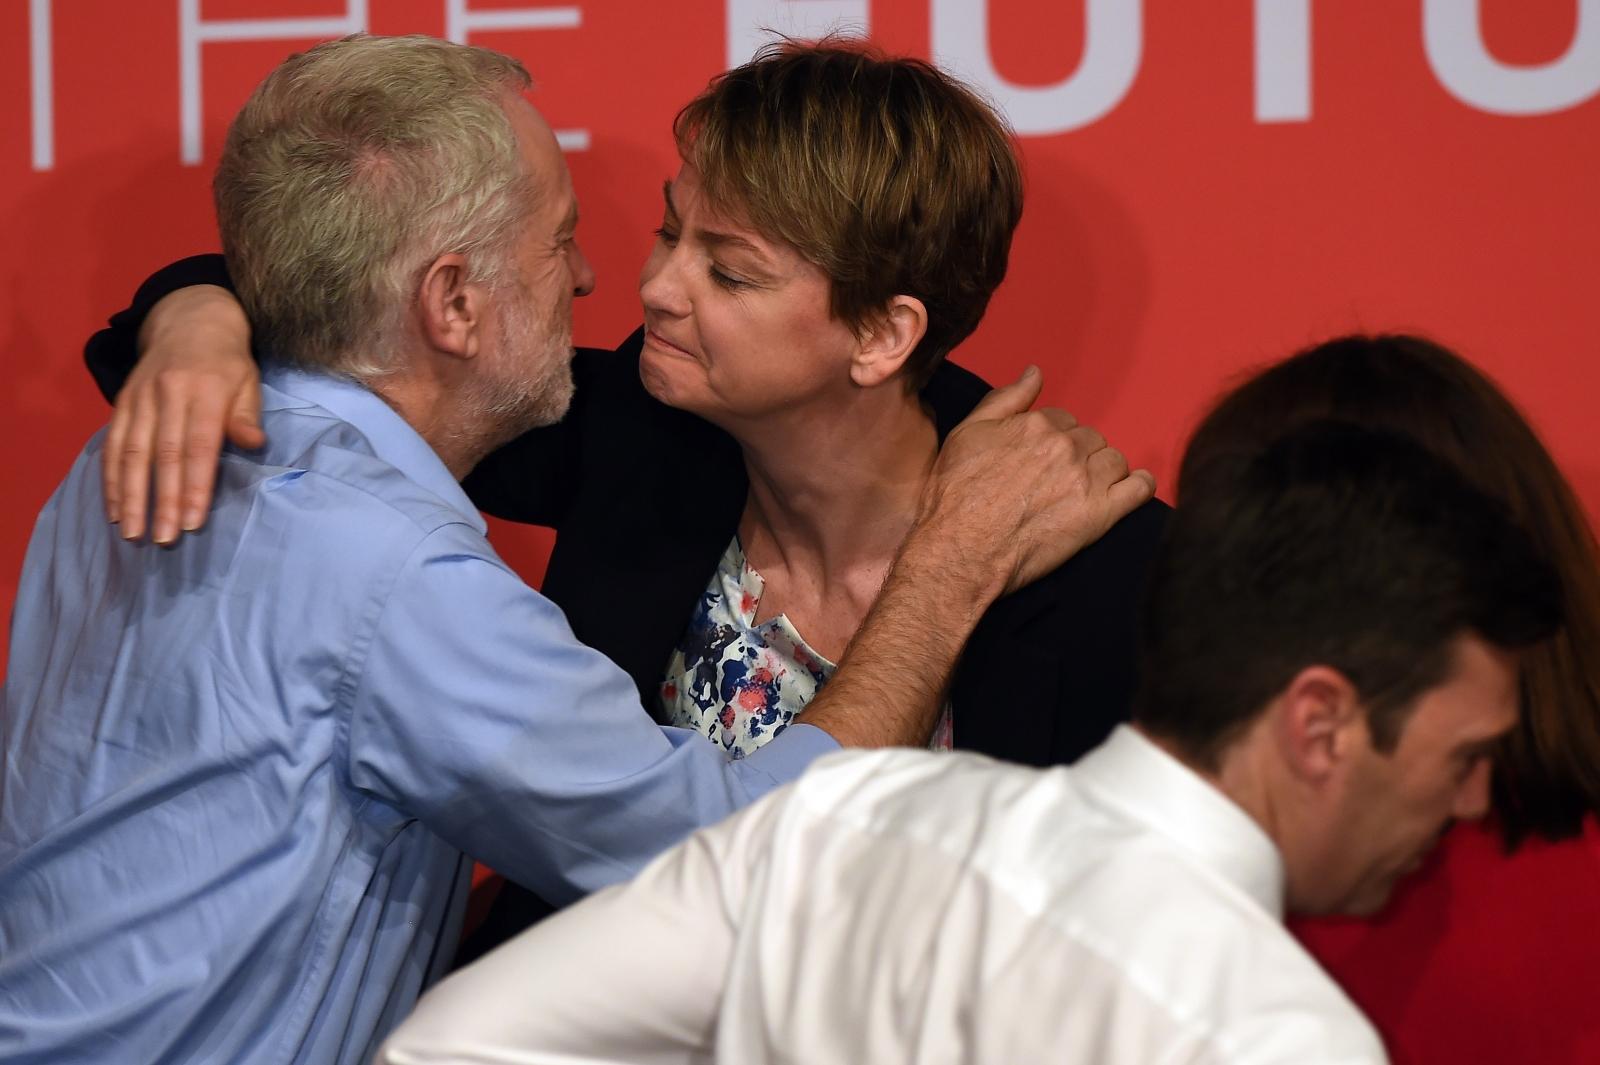 Jeremy Corbyn and Yvette Cooper